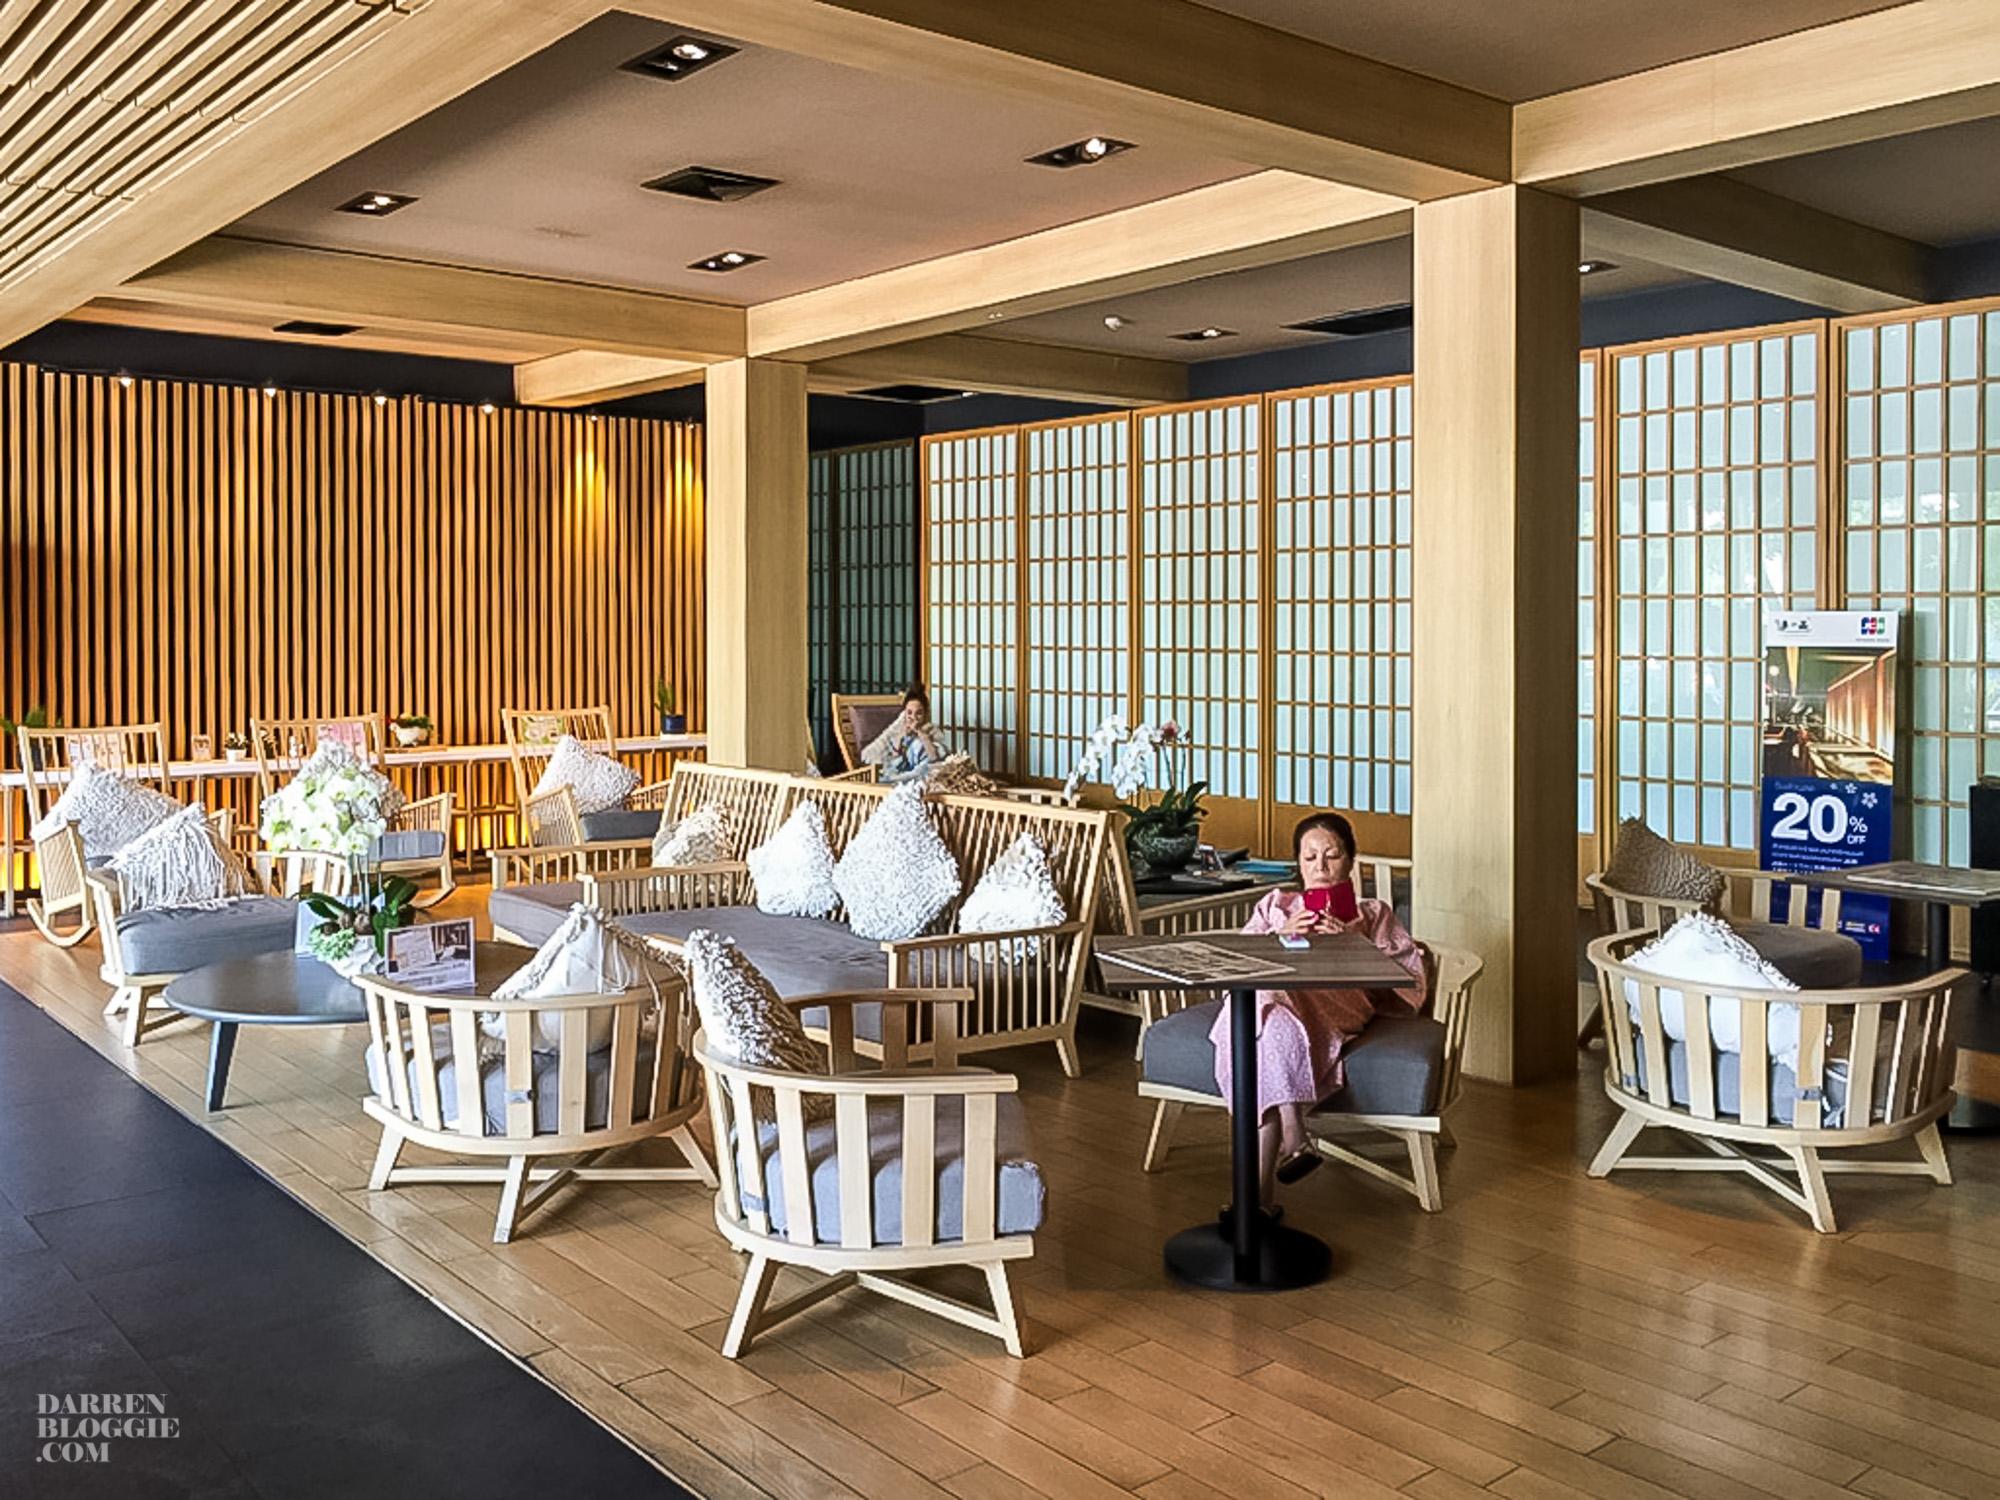 Yunomori-Onsen-Spa-Bangkok-thailand-8